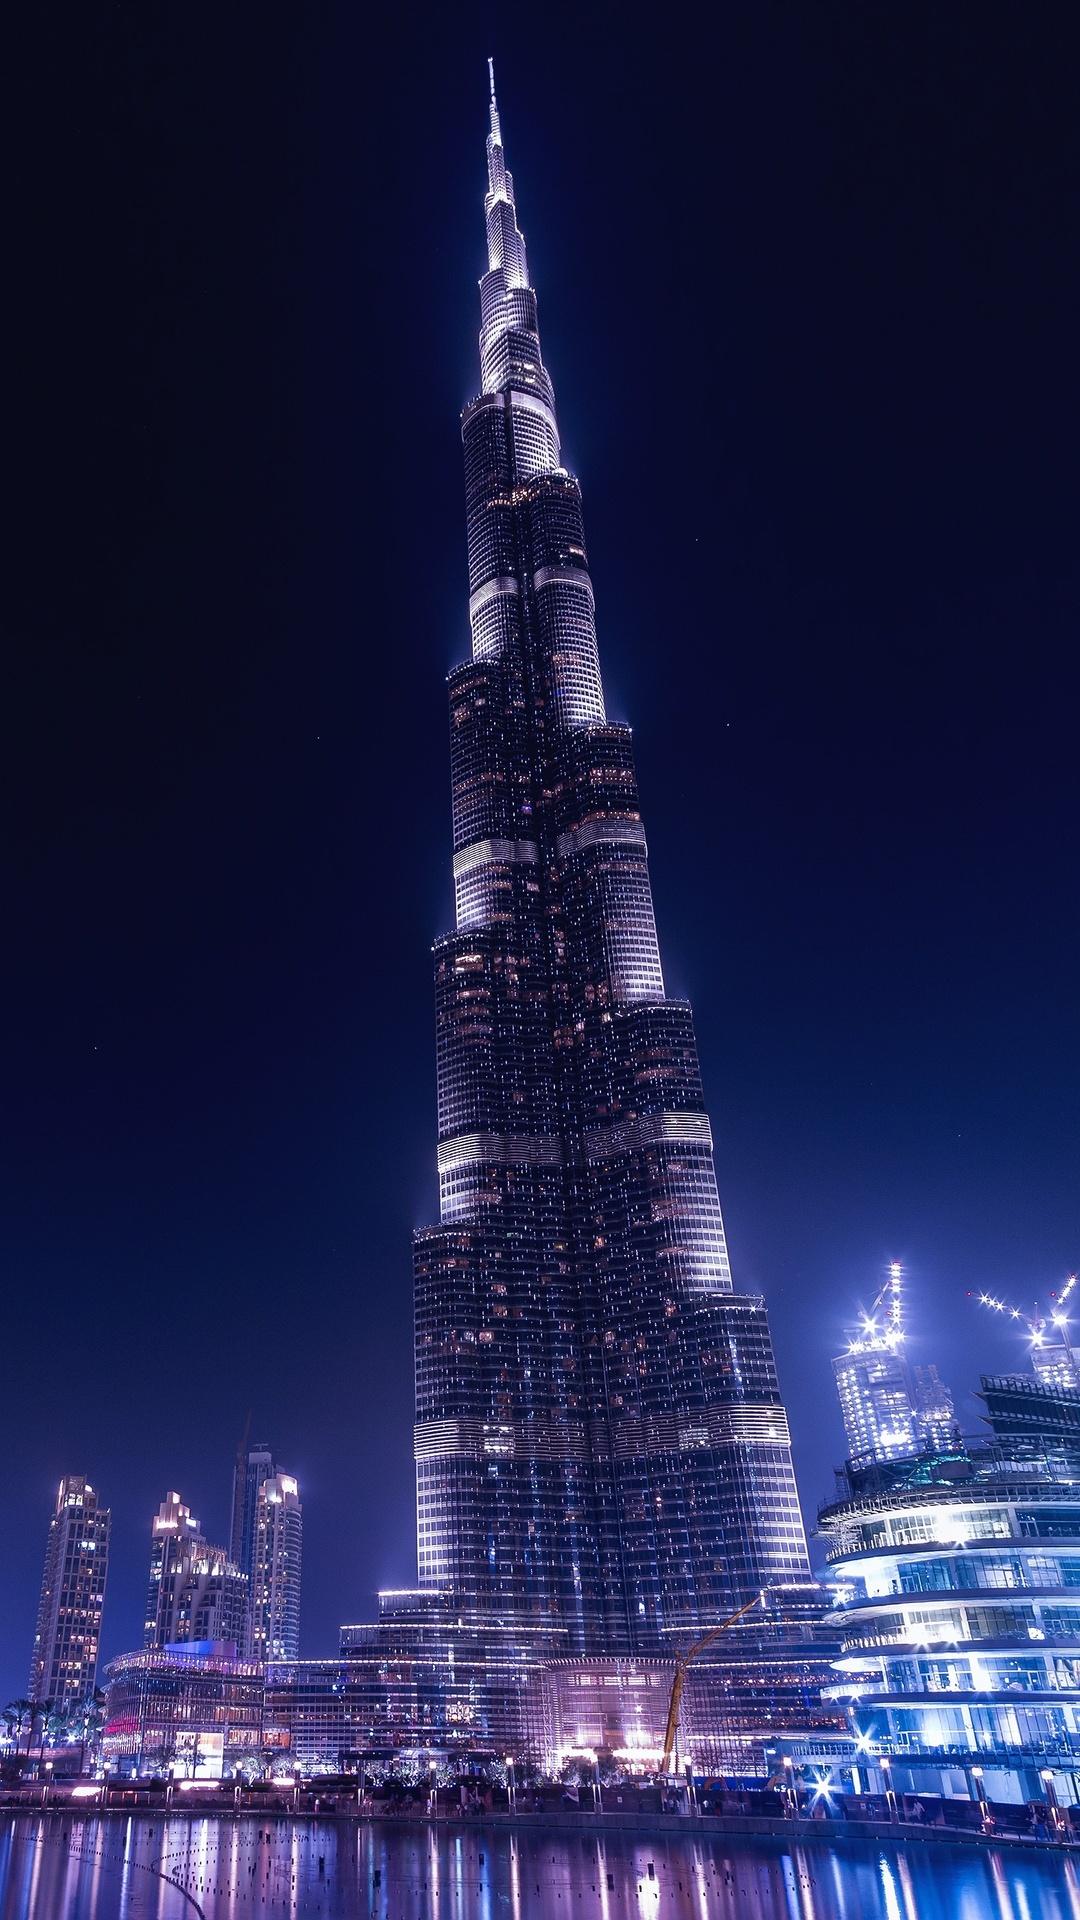 1080x1920 burj khalifa dubai night iphone 7 6s 6 plus pixel xl one plus 3 3t 5 hd 4k - Dubai burj khalifa hd photos ...